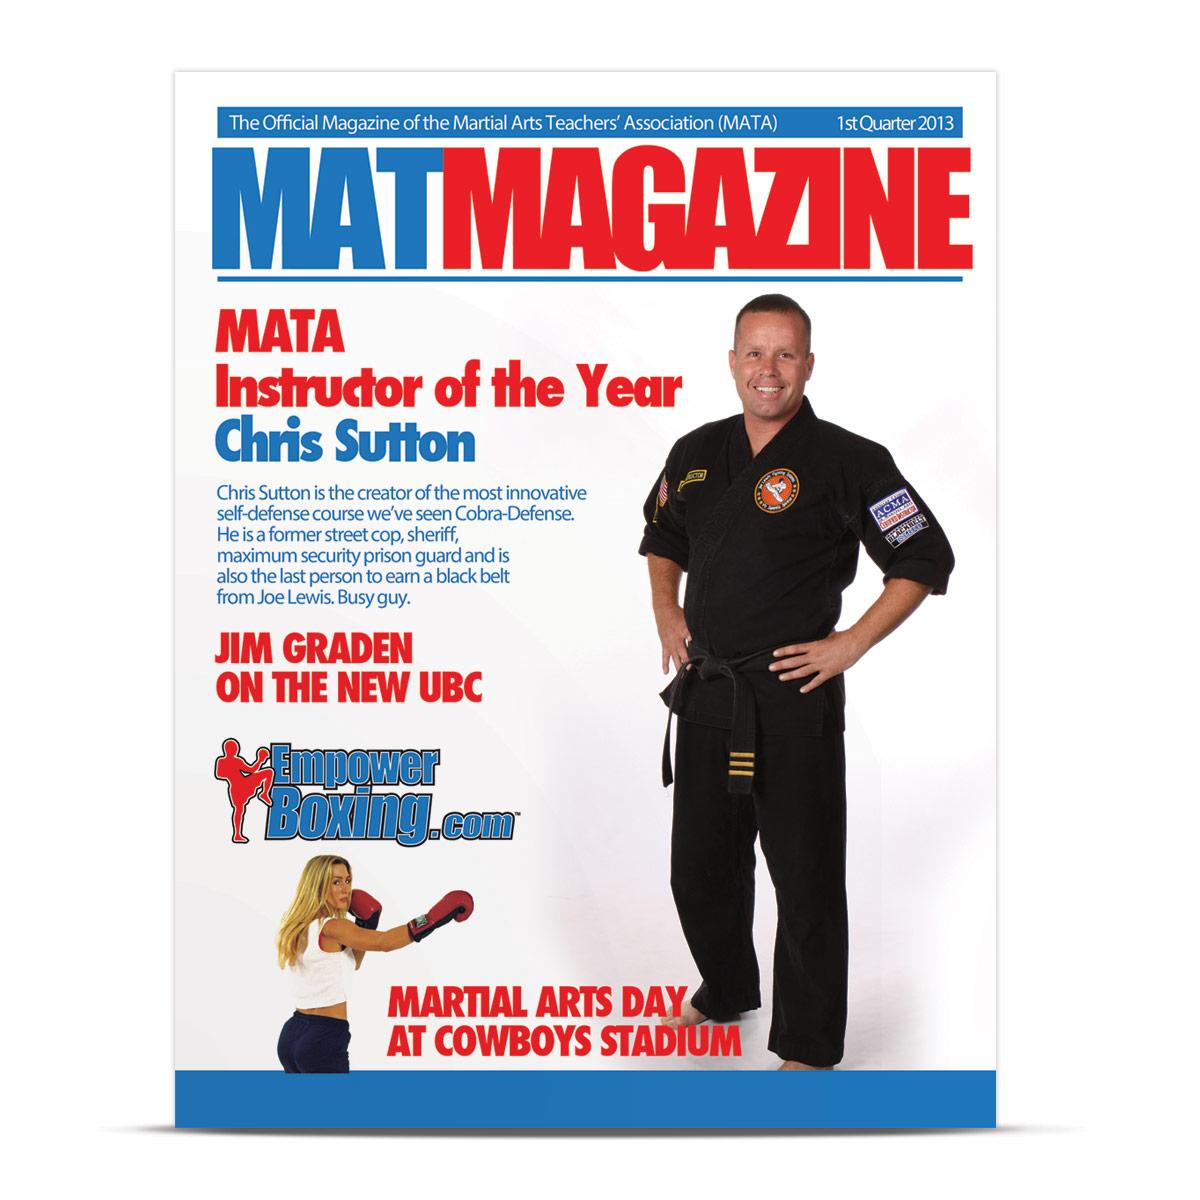 MAT Magazine cover